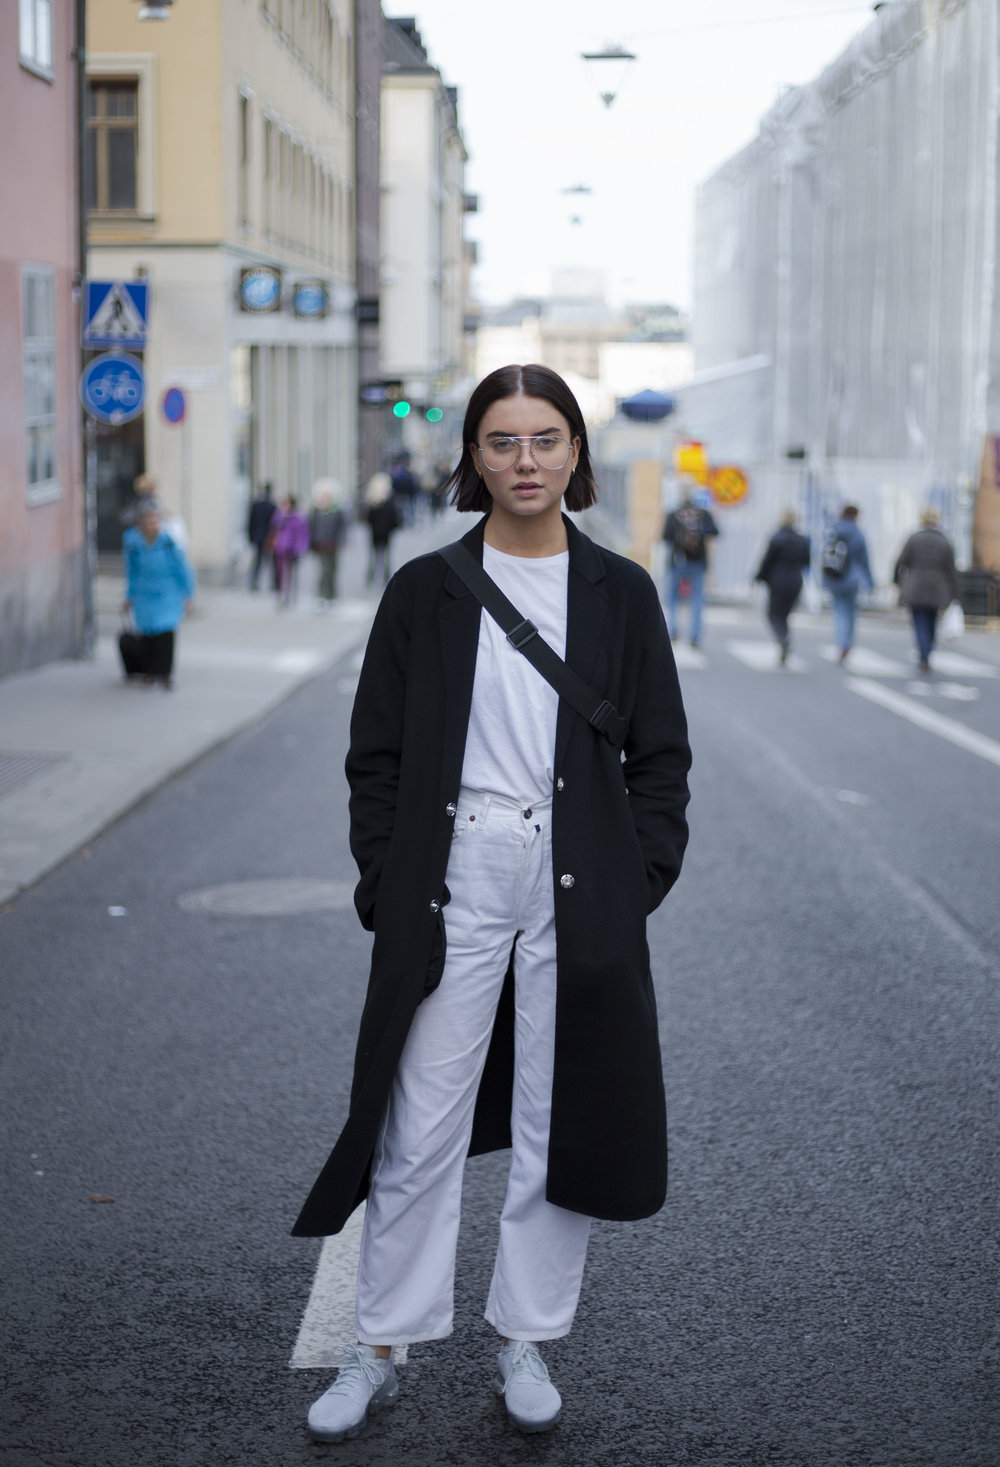 street-style-stockholm_streetstyle_thestreetland_streetland_bryndis_thorsteinsdottir_fashion_5_nordic_citystye_mode.jpg.jpg